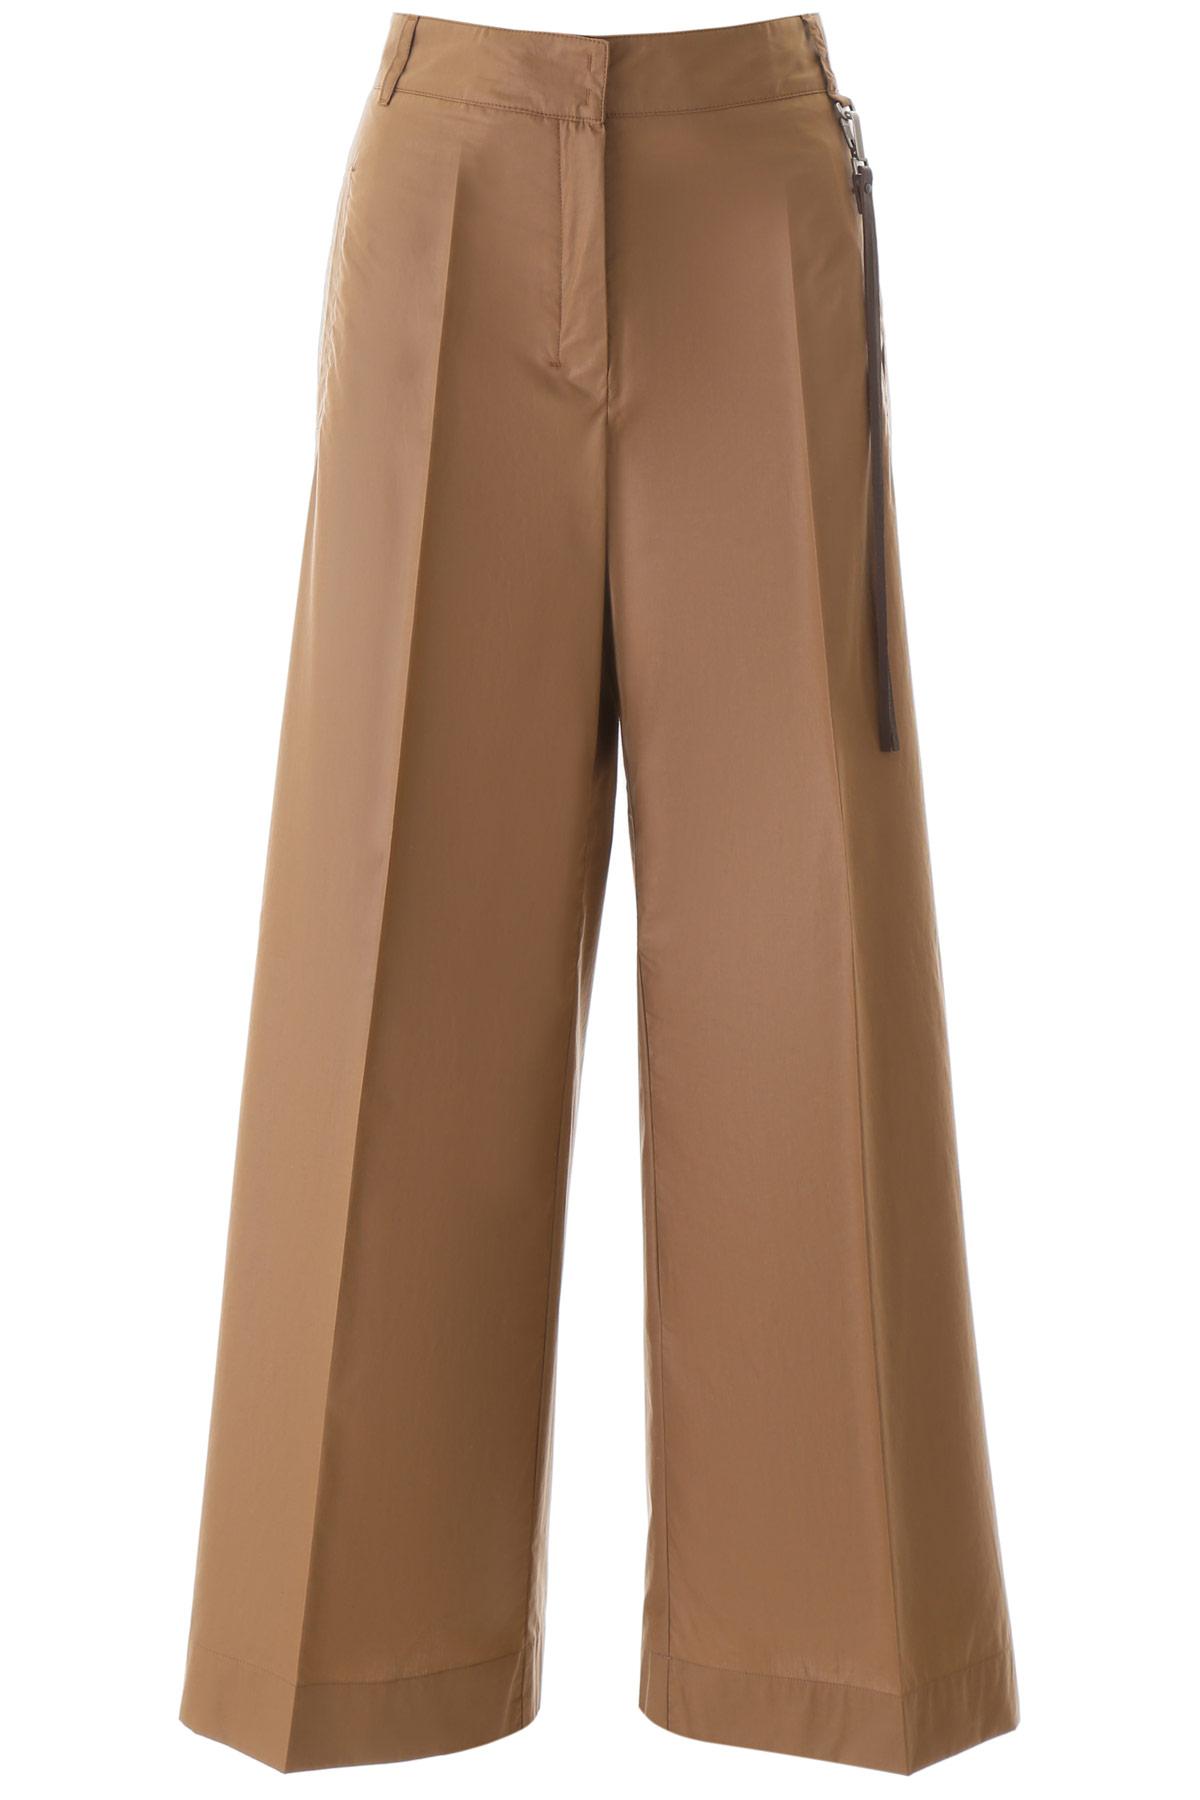 'S MAX MARA WIDE PANTS 44 Brown Cotton